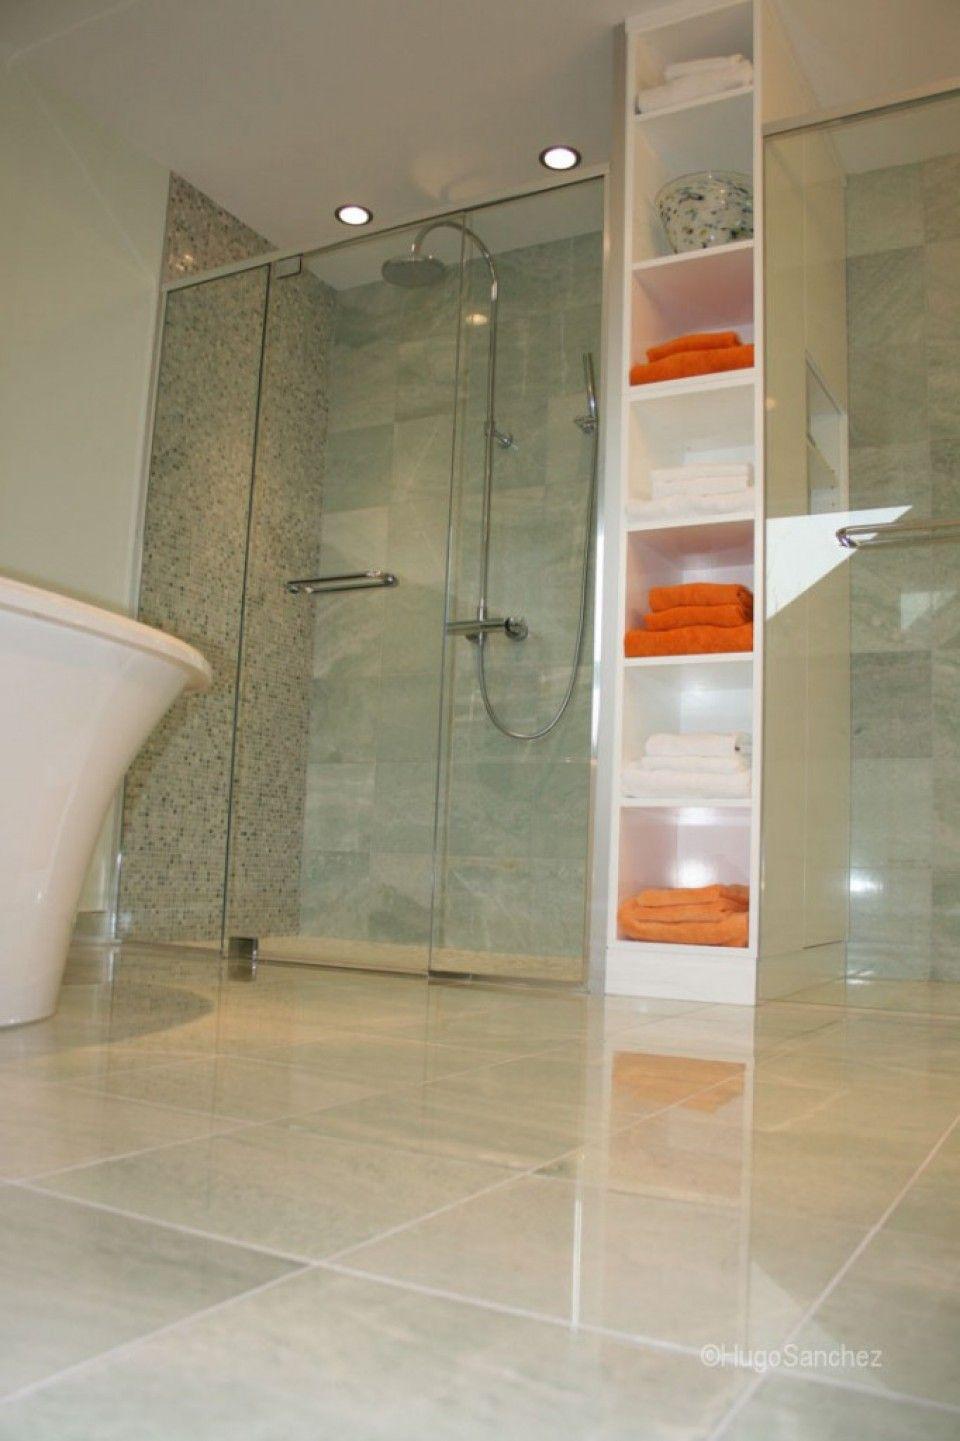 Ming green marble bathroom cramiques hugo sanchez inc ming green marble bathroom cramiques hugo sanchez inc dailygadgetfo Images